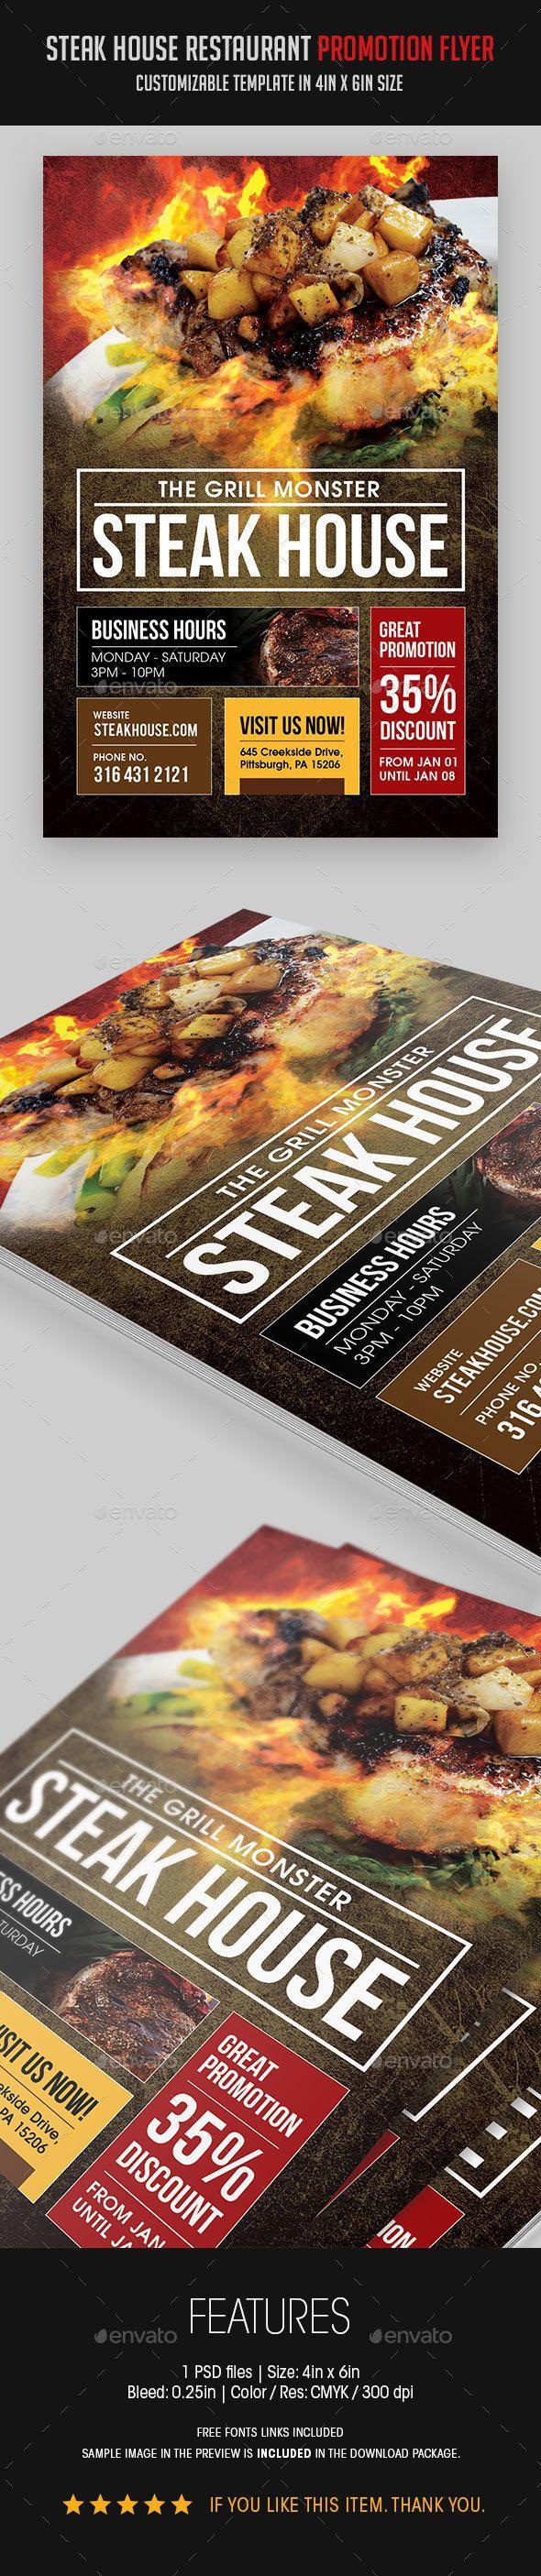 The 25 Best Steak House Menu Ideas On Pinterest Steak Em Up